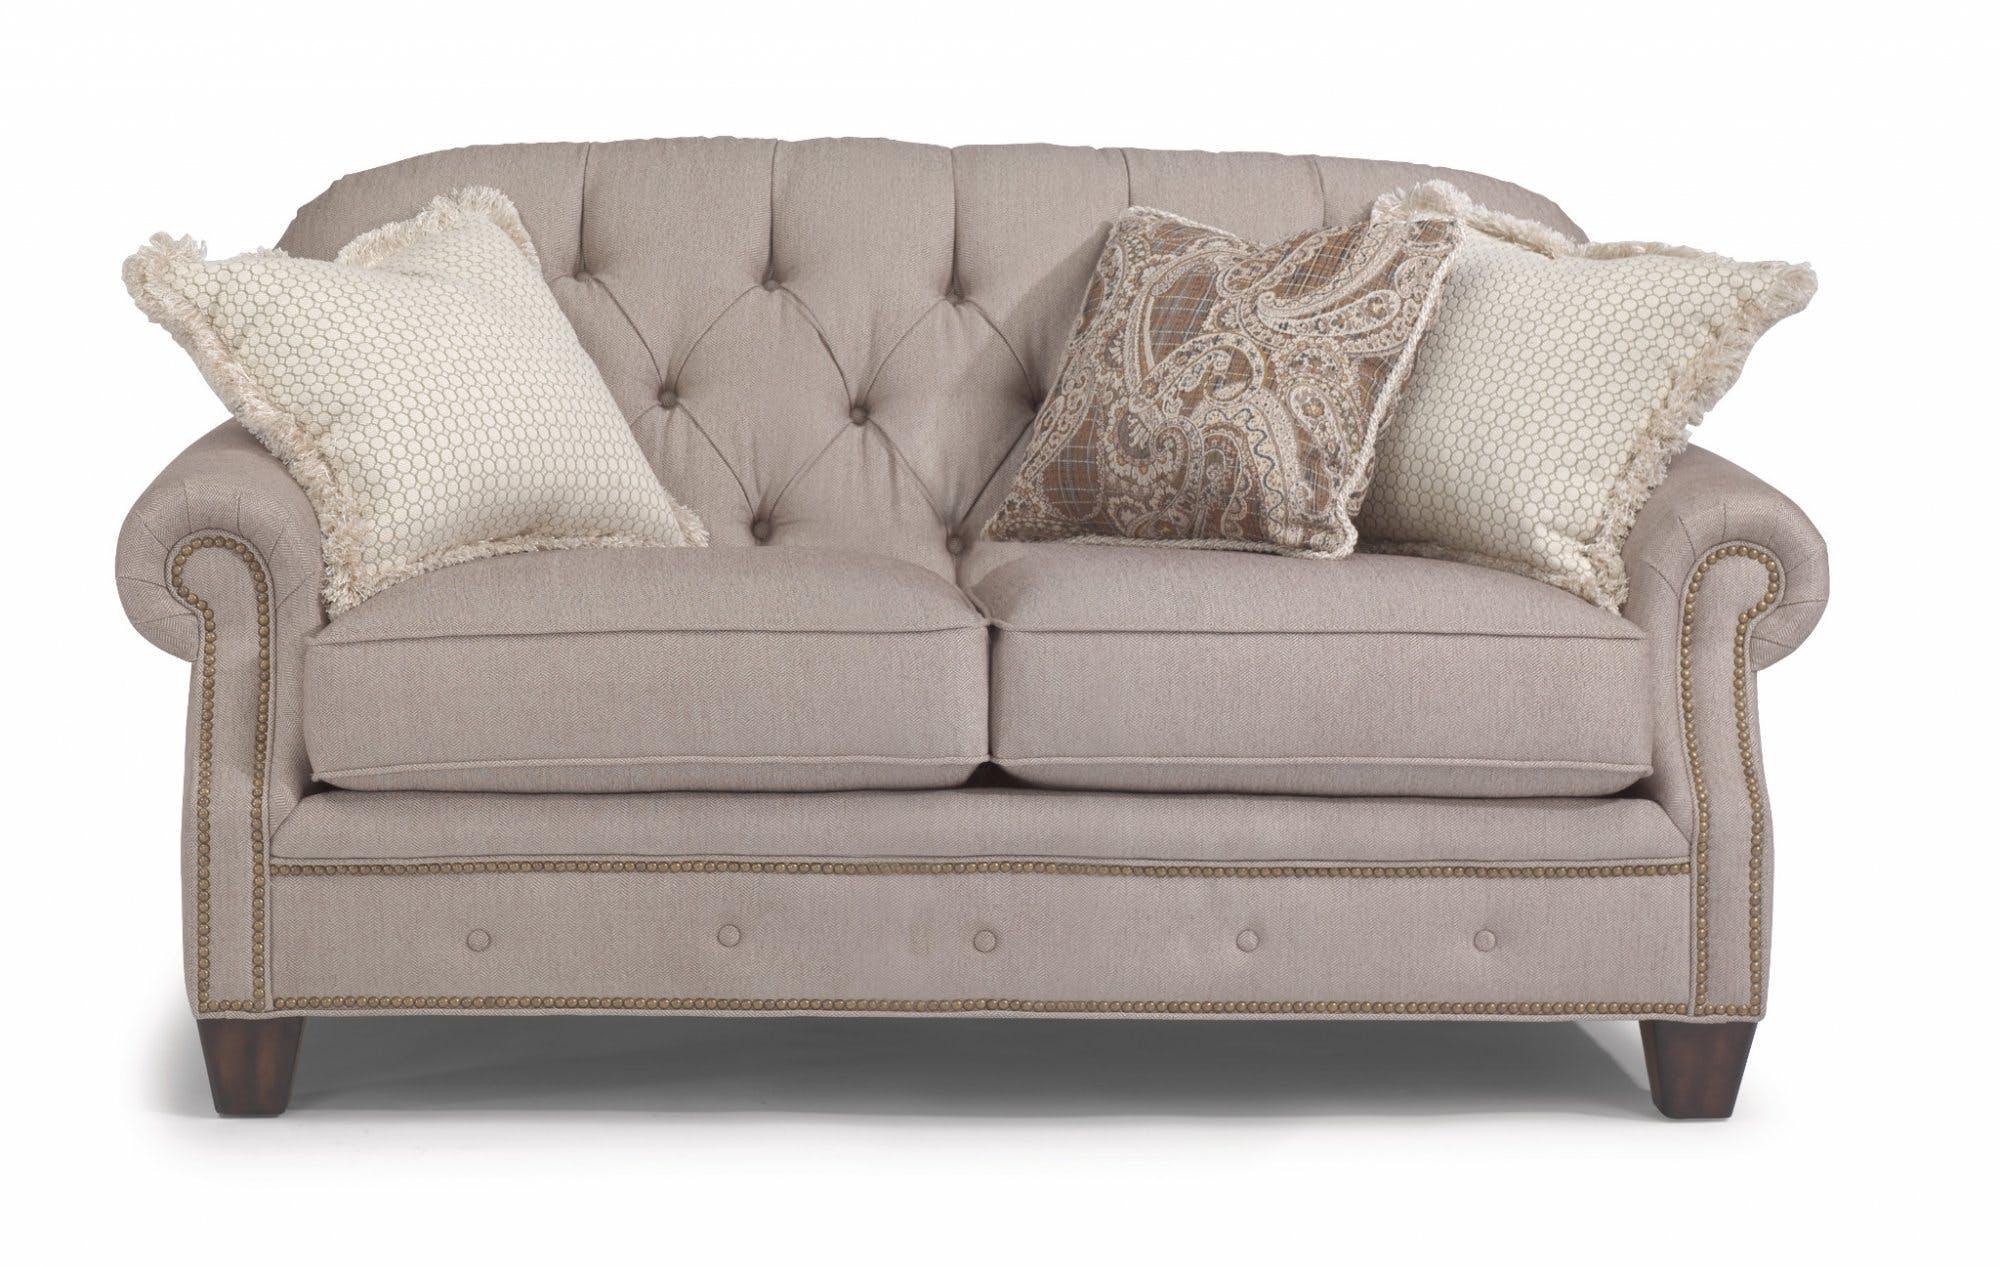 Flexsteel Living Room Fabric Loveseat 7386-20 - Kettle River